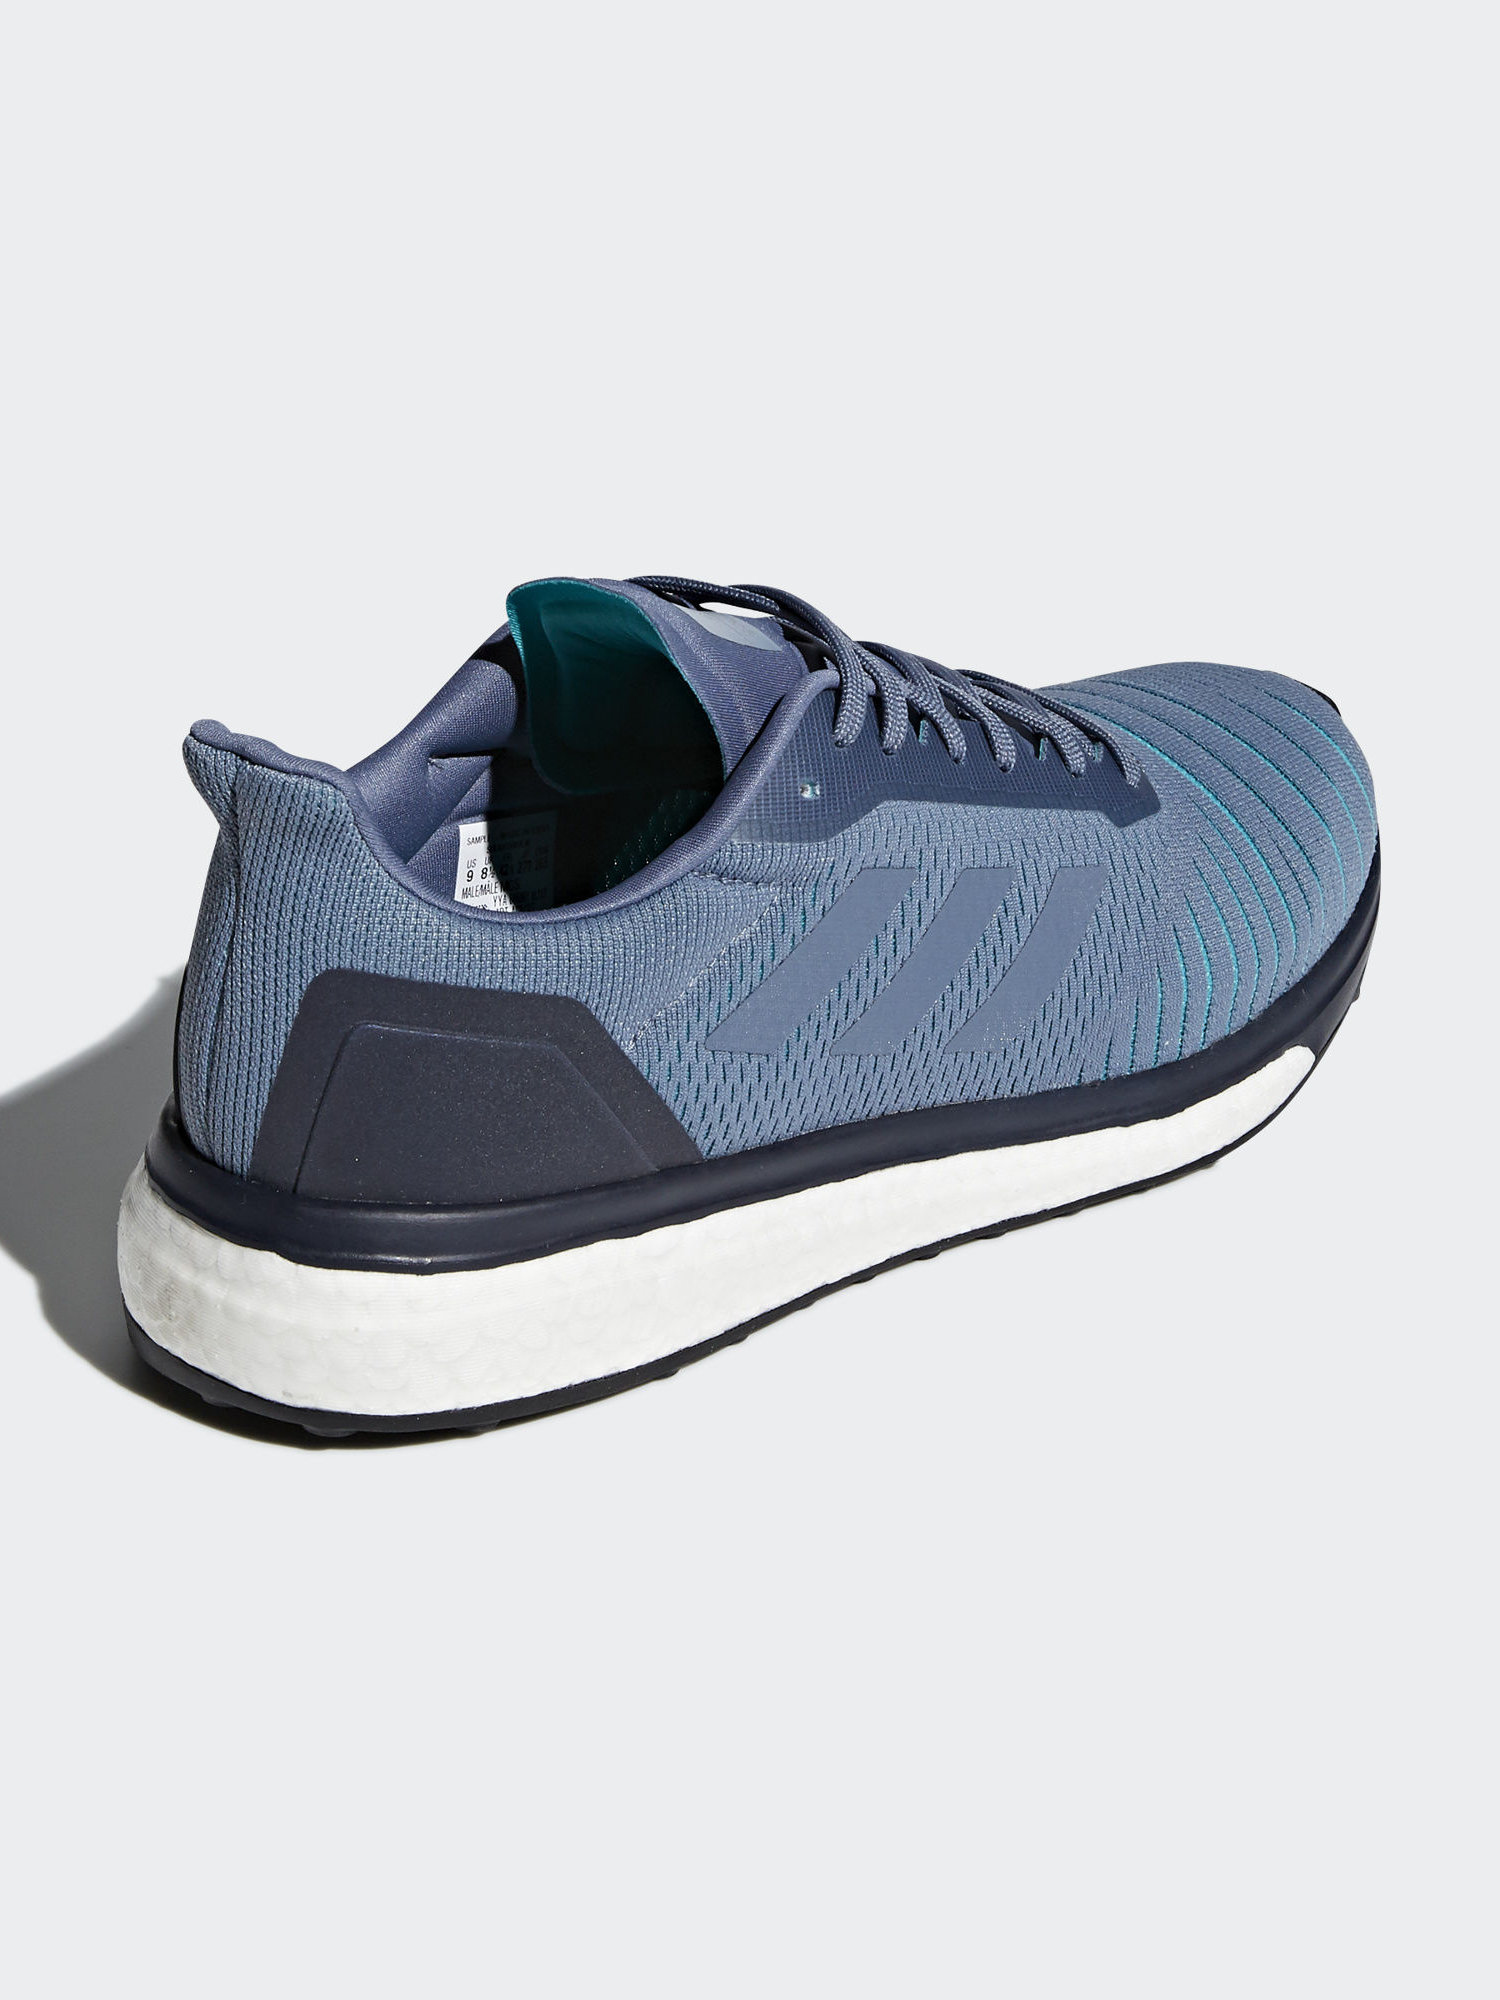 Corsa Scarpe Scarpe Solar Drive Boost Running Sneakers da ginnastica Adidas Blu t787xwZpqI